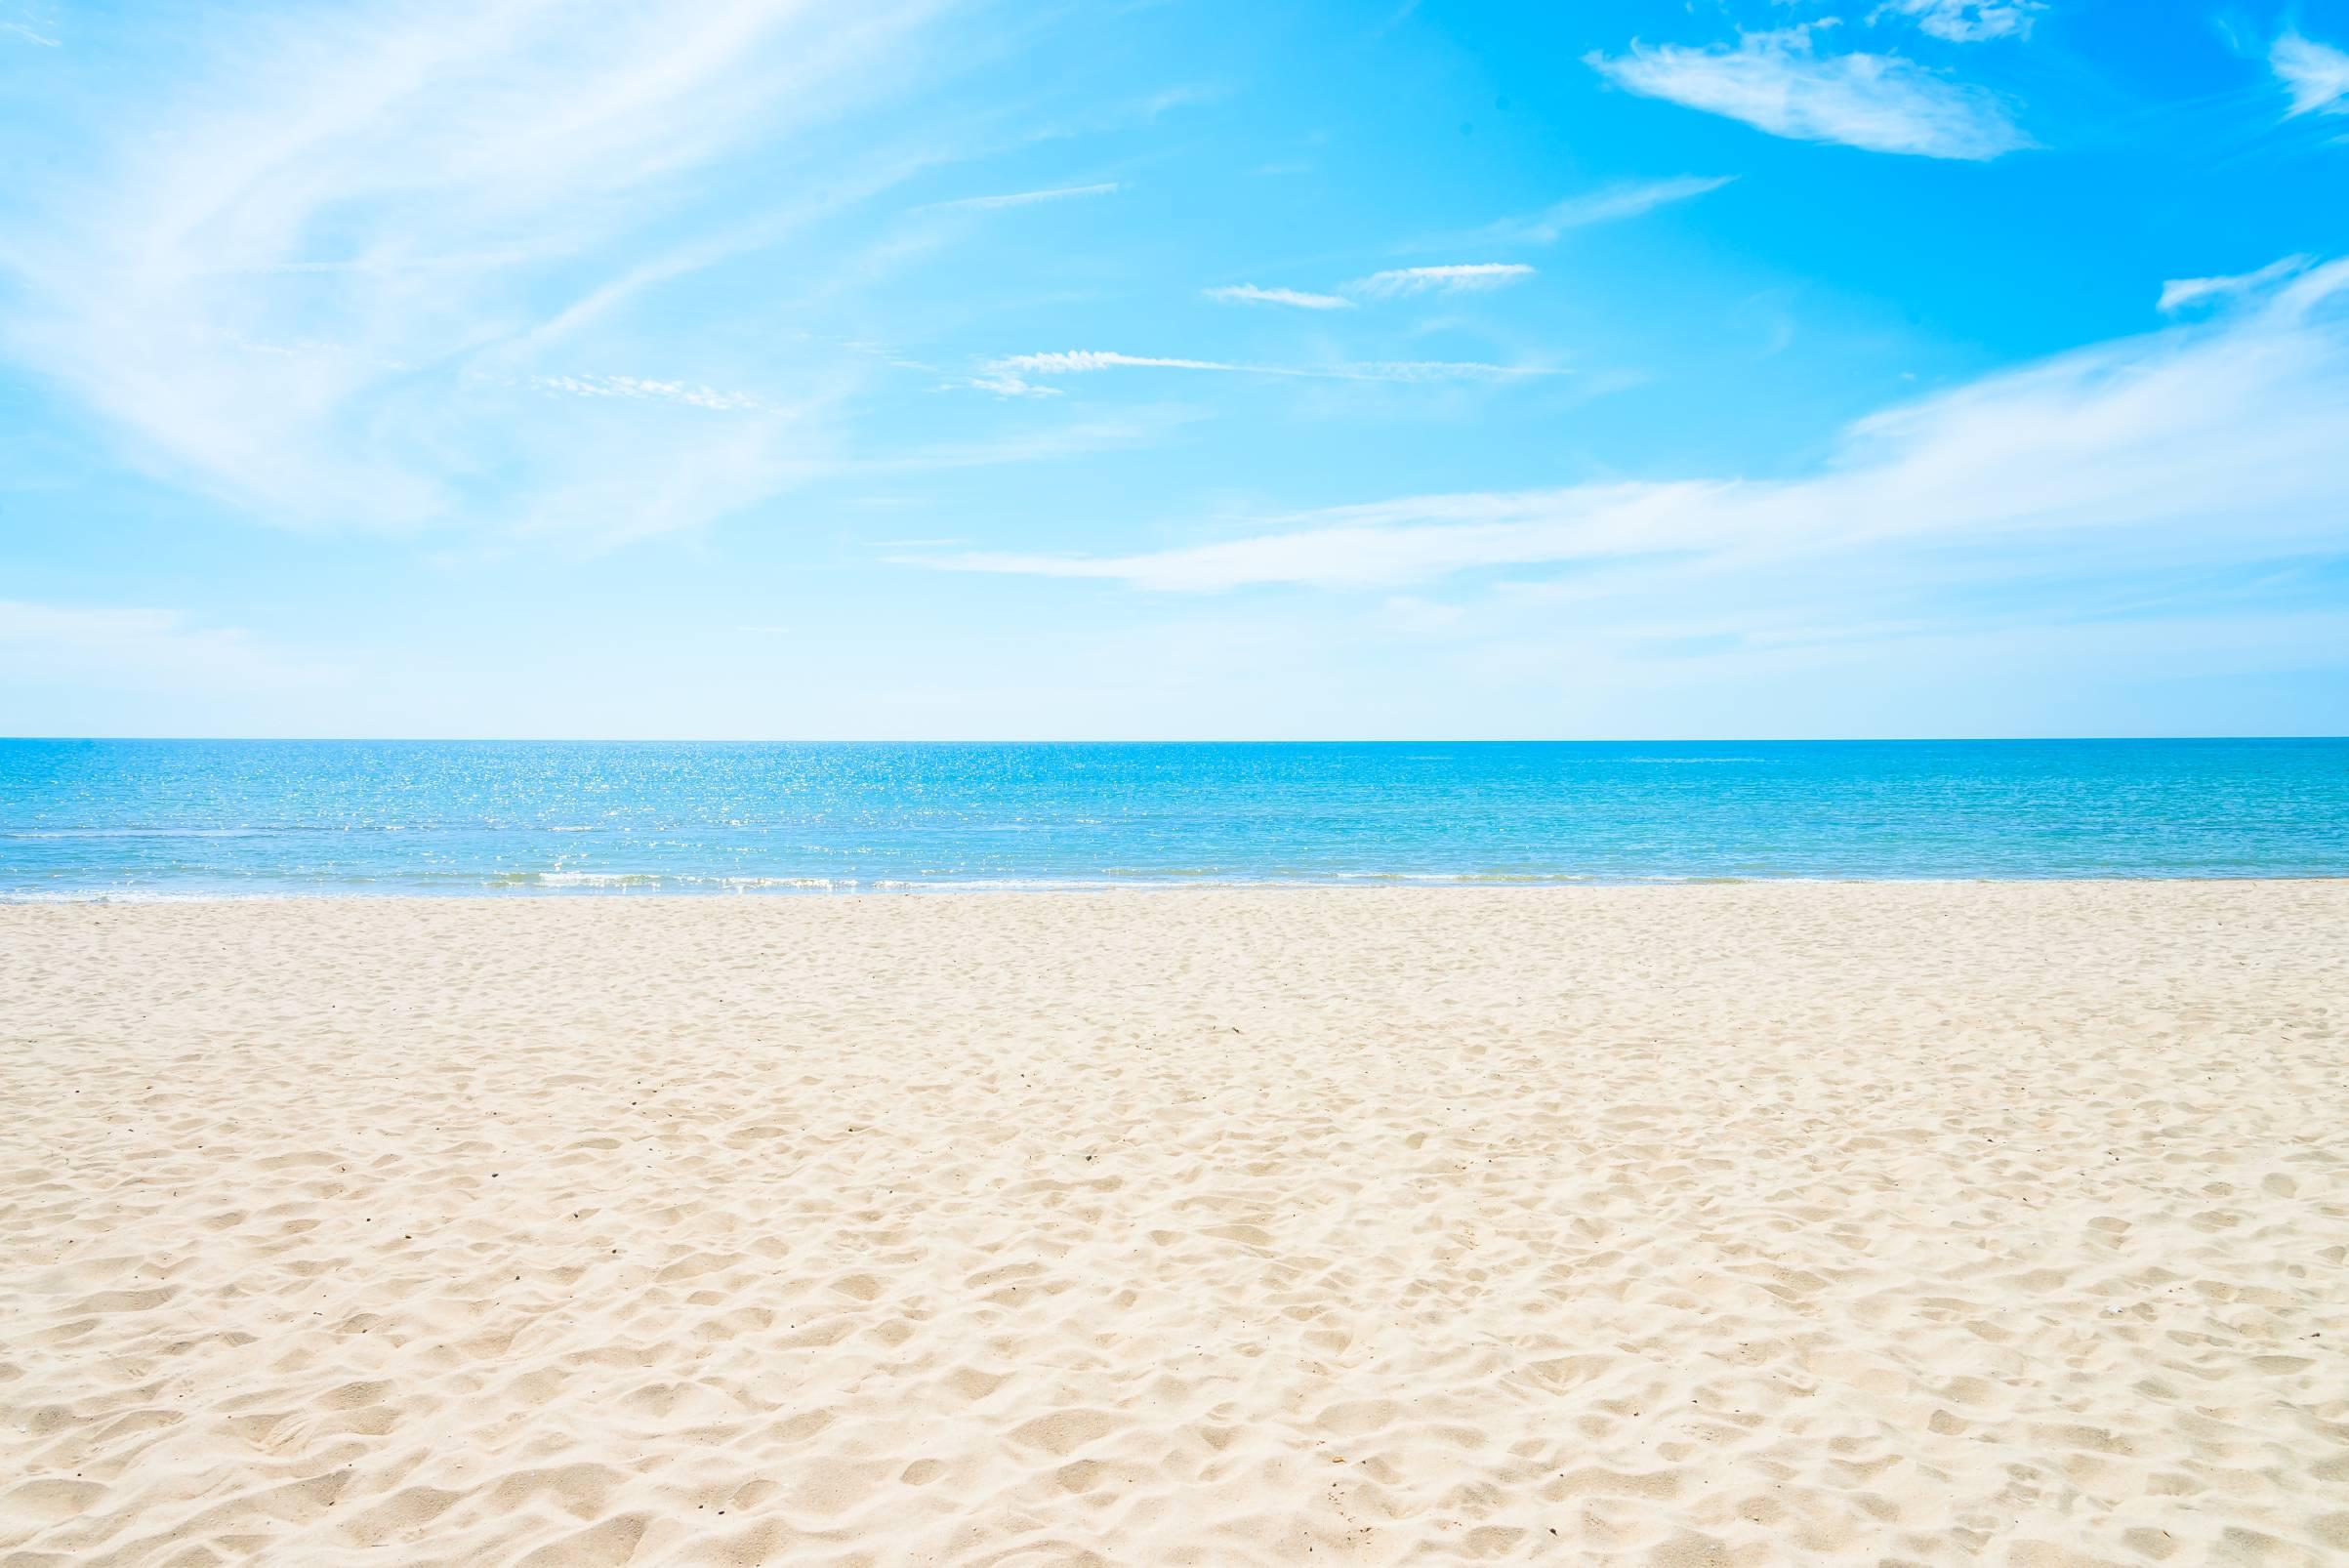 empty-sea-and-beach-background (2)